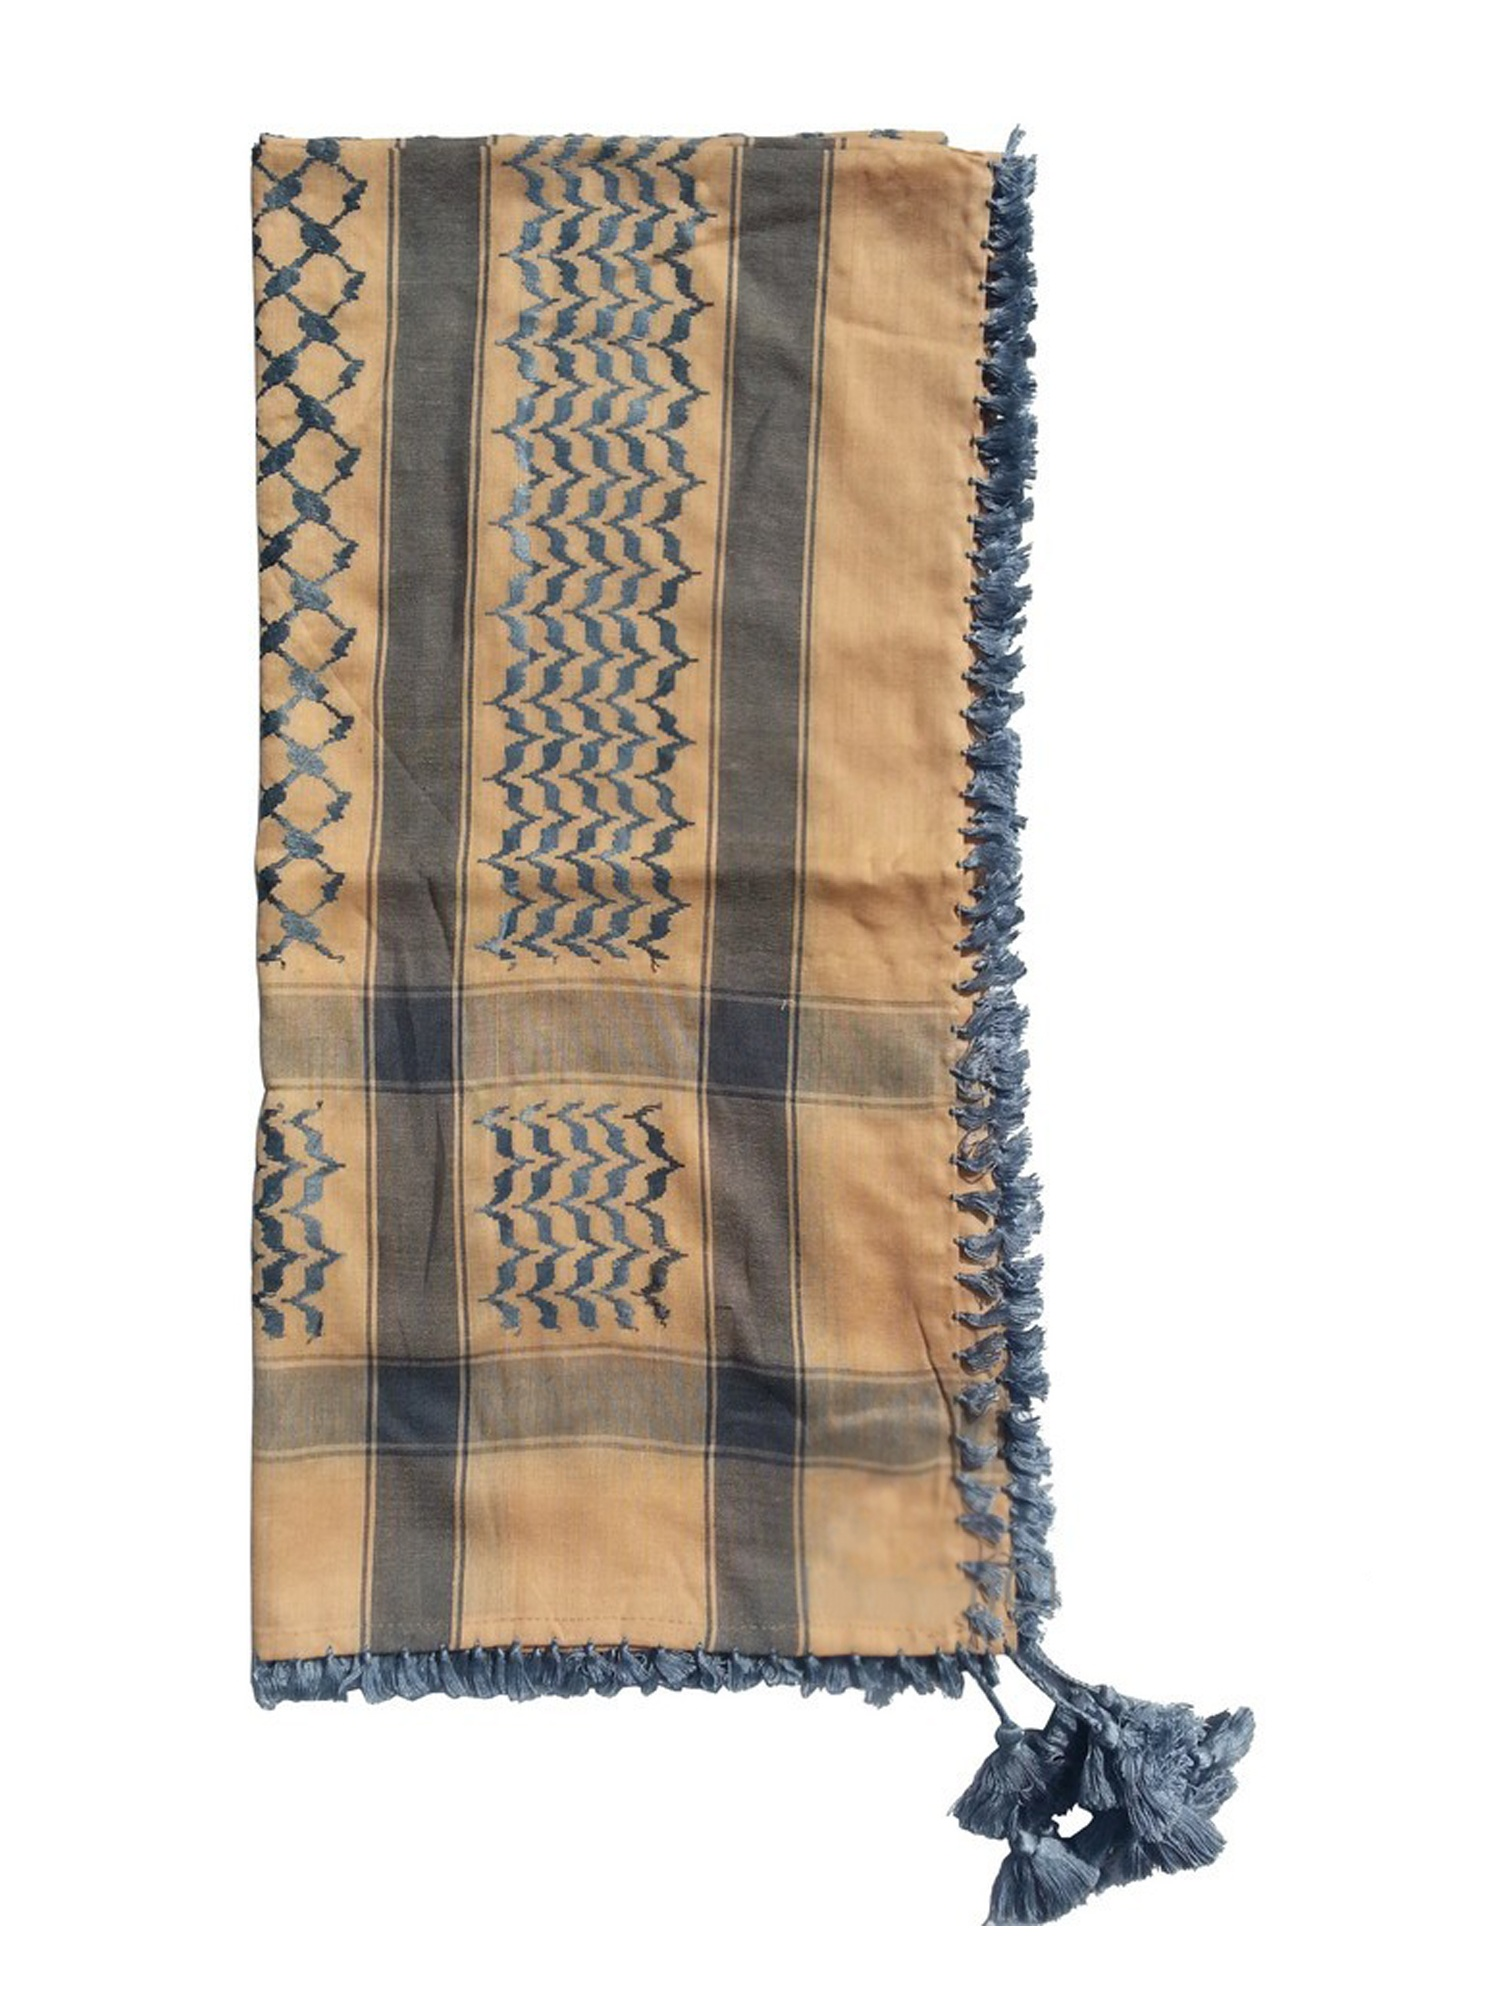 MuslimClothing® Dark Brown & White Keffiyeh Men's Muslim Arafat Scarf Shawl Turban Sorban Shawl Turban Sorban